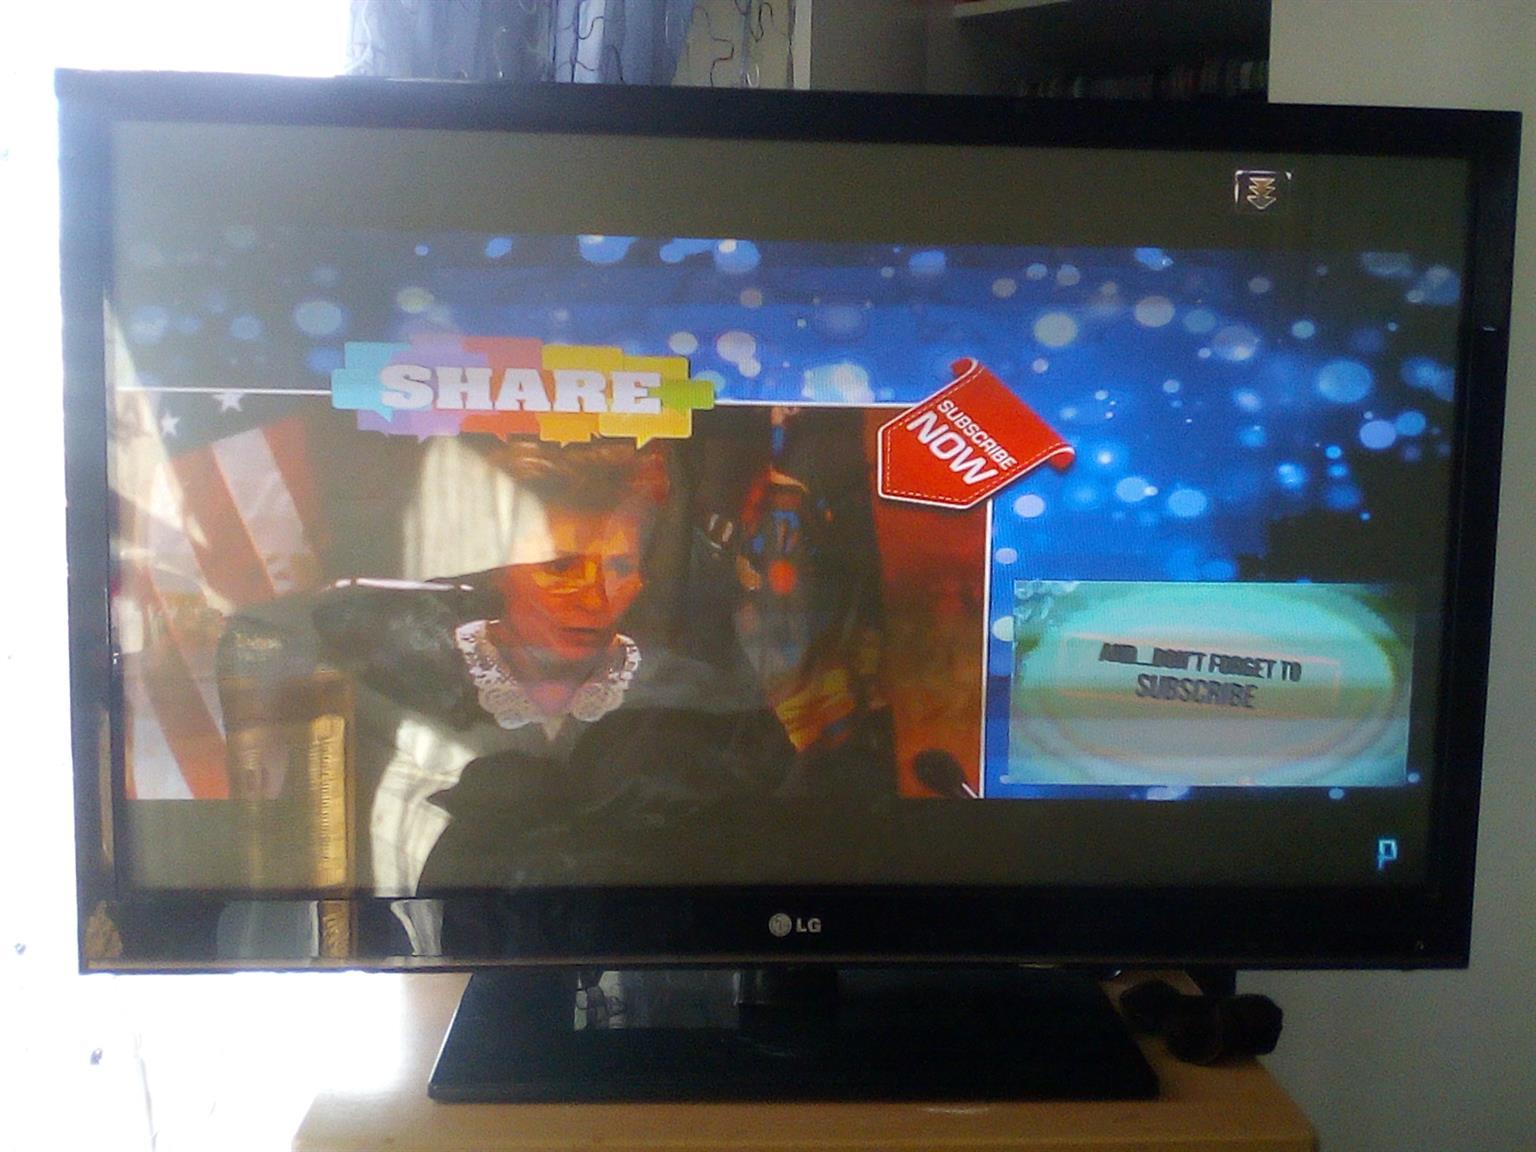 47inch HD LG smart flat screen tv - R4500(!!PENDING!!)pickup